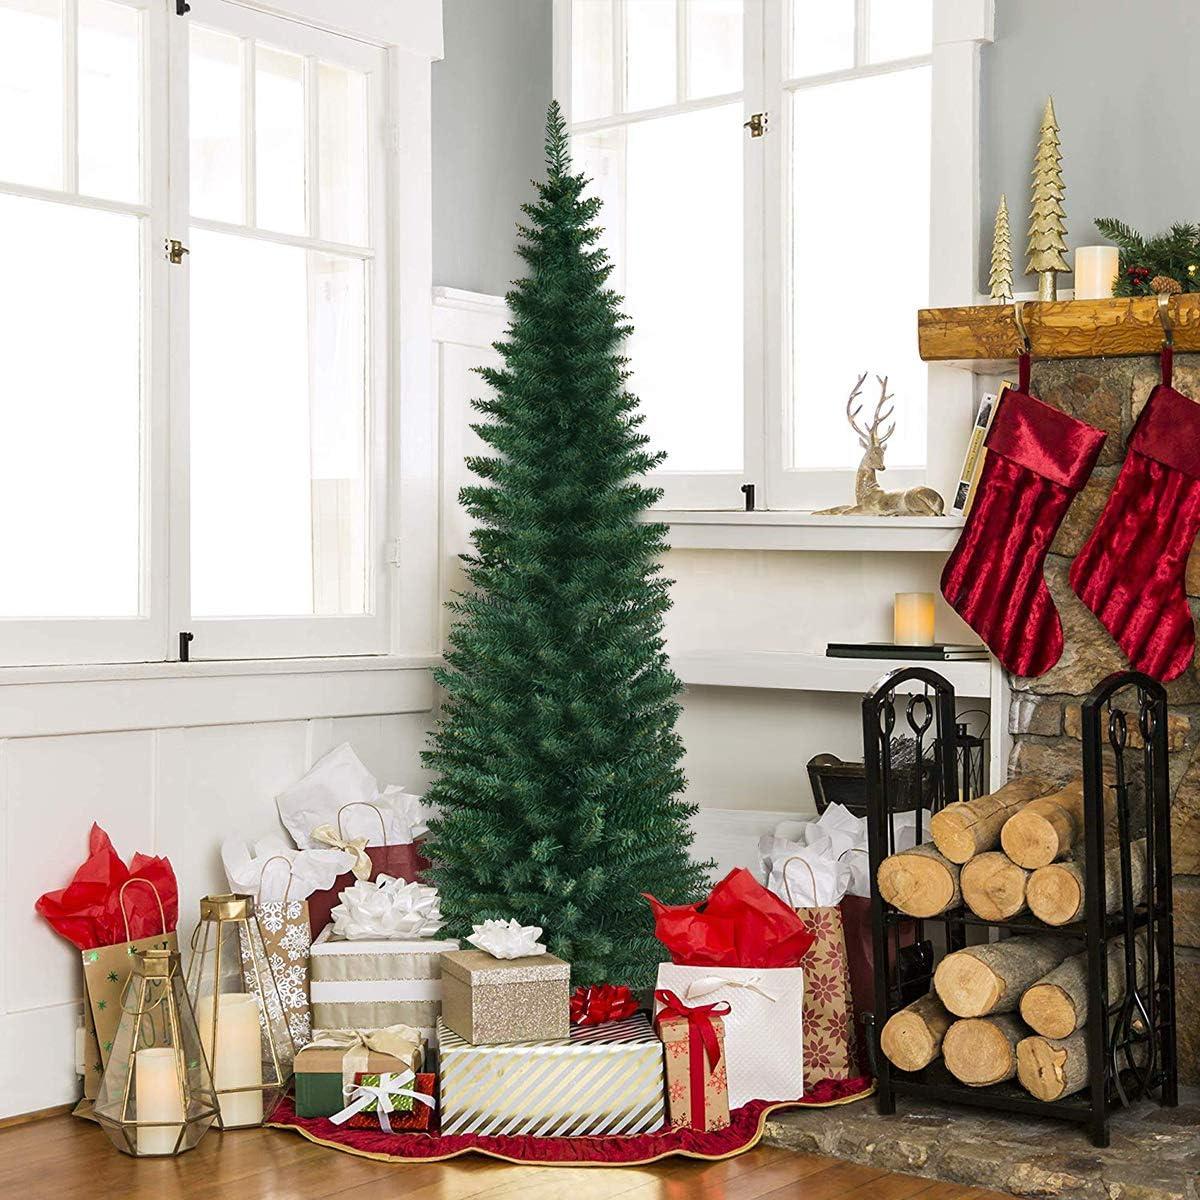 Goplus Artificial Pencil Max 41% OFF Christmas Tree Daily bargain sale M PVC Sturdy w Slim